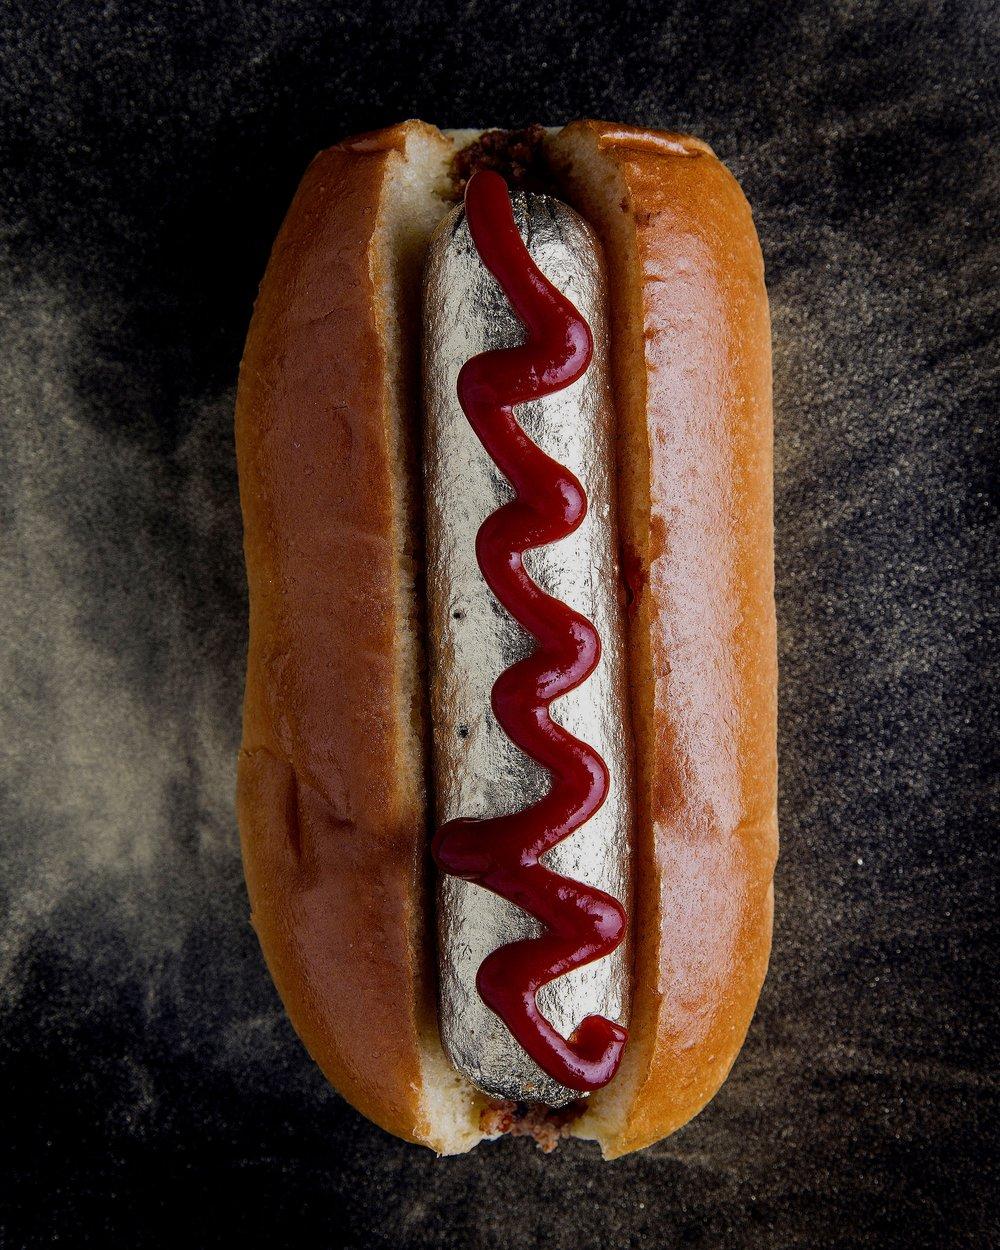 Gold hot dog with ketchup